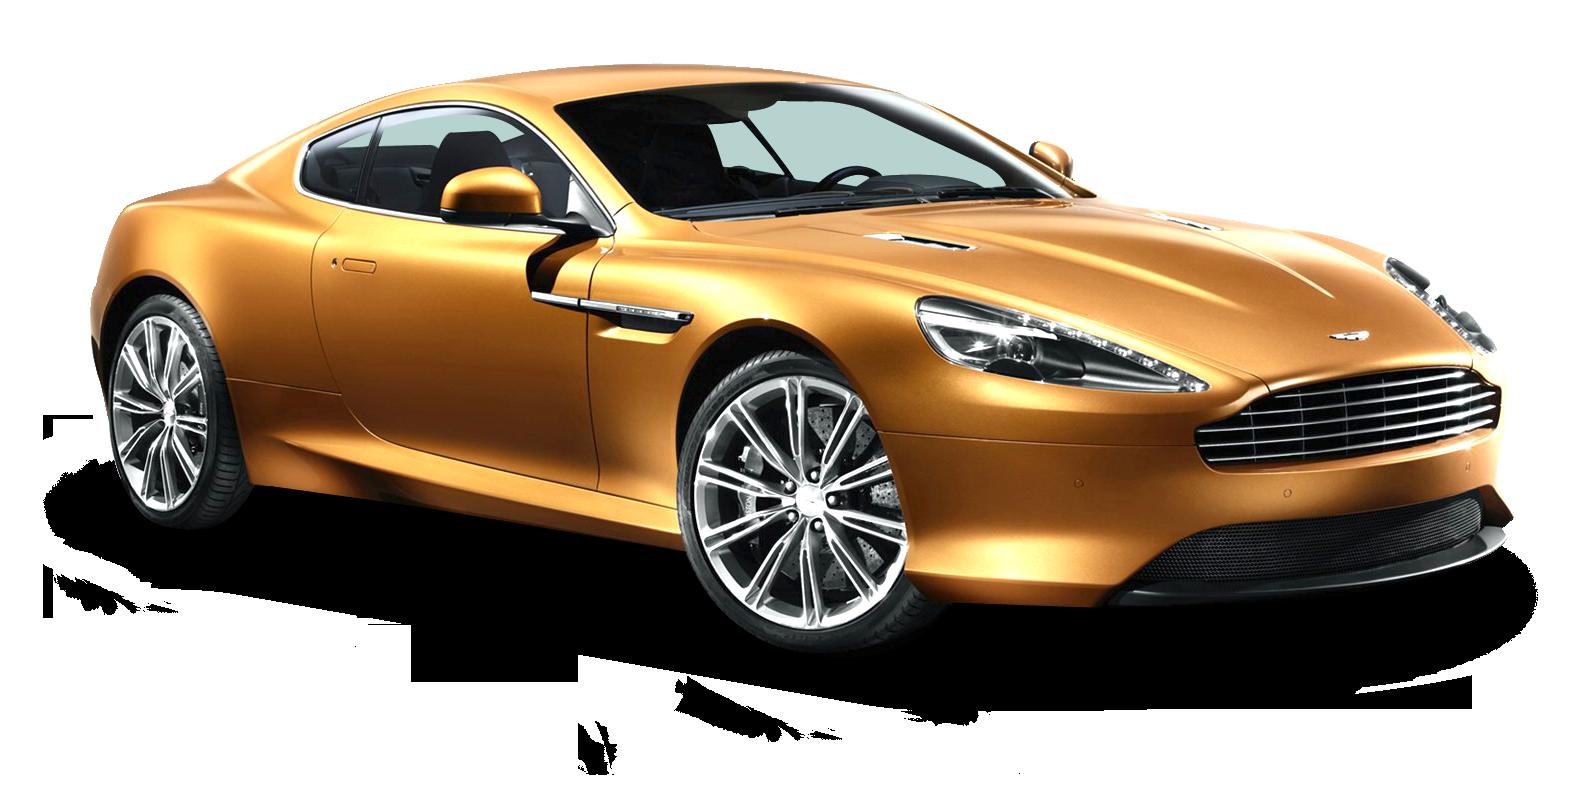 Cars PNG images free download, car PNG.